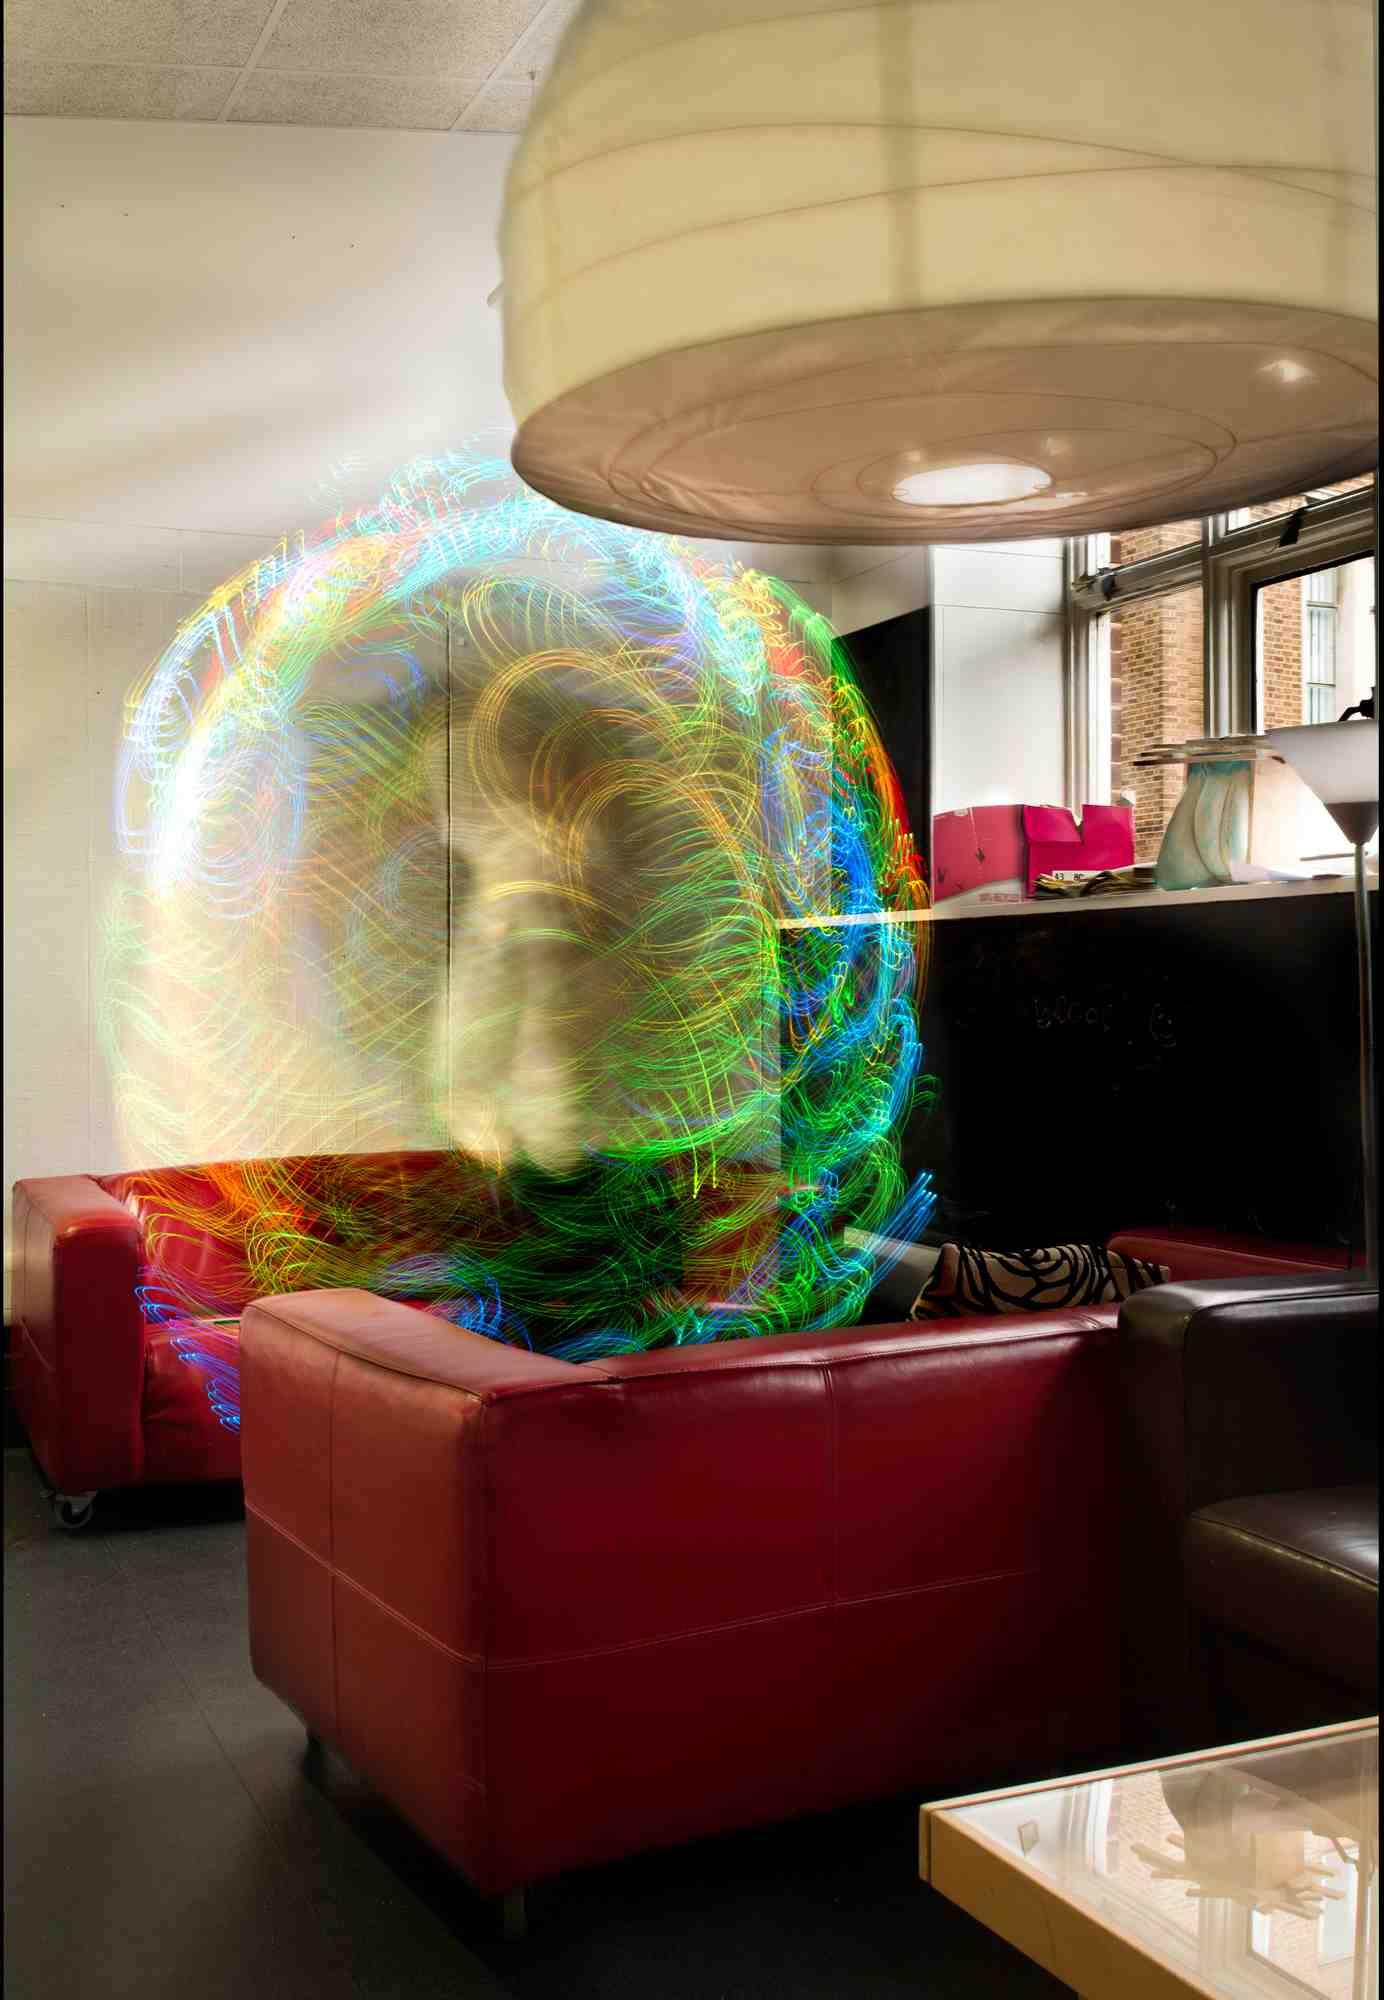 wifi radiation image in a lounge electricsense